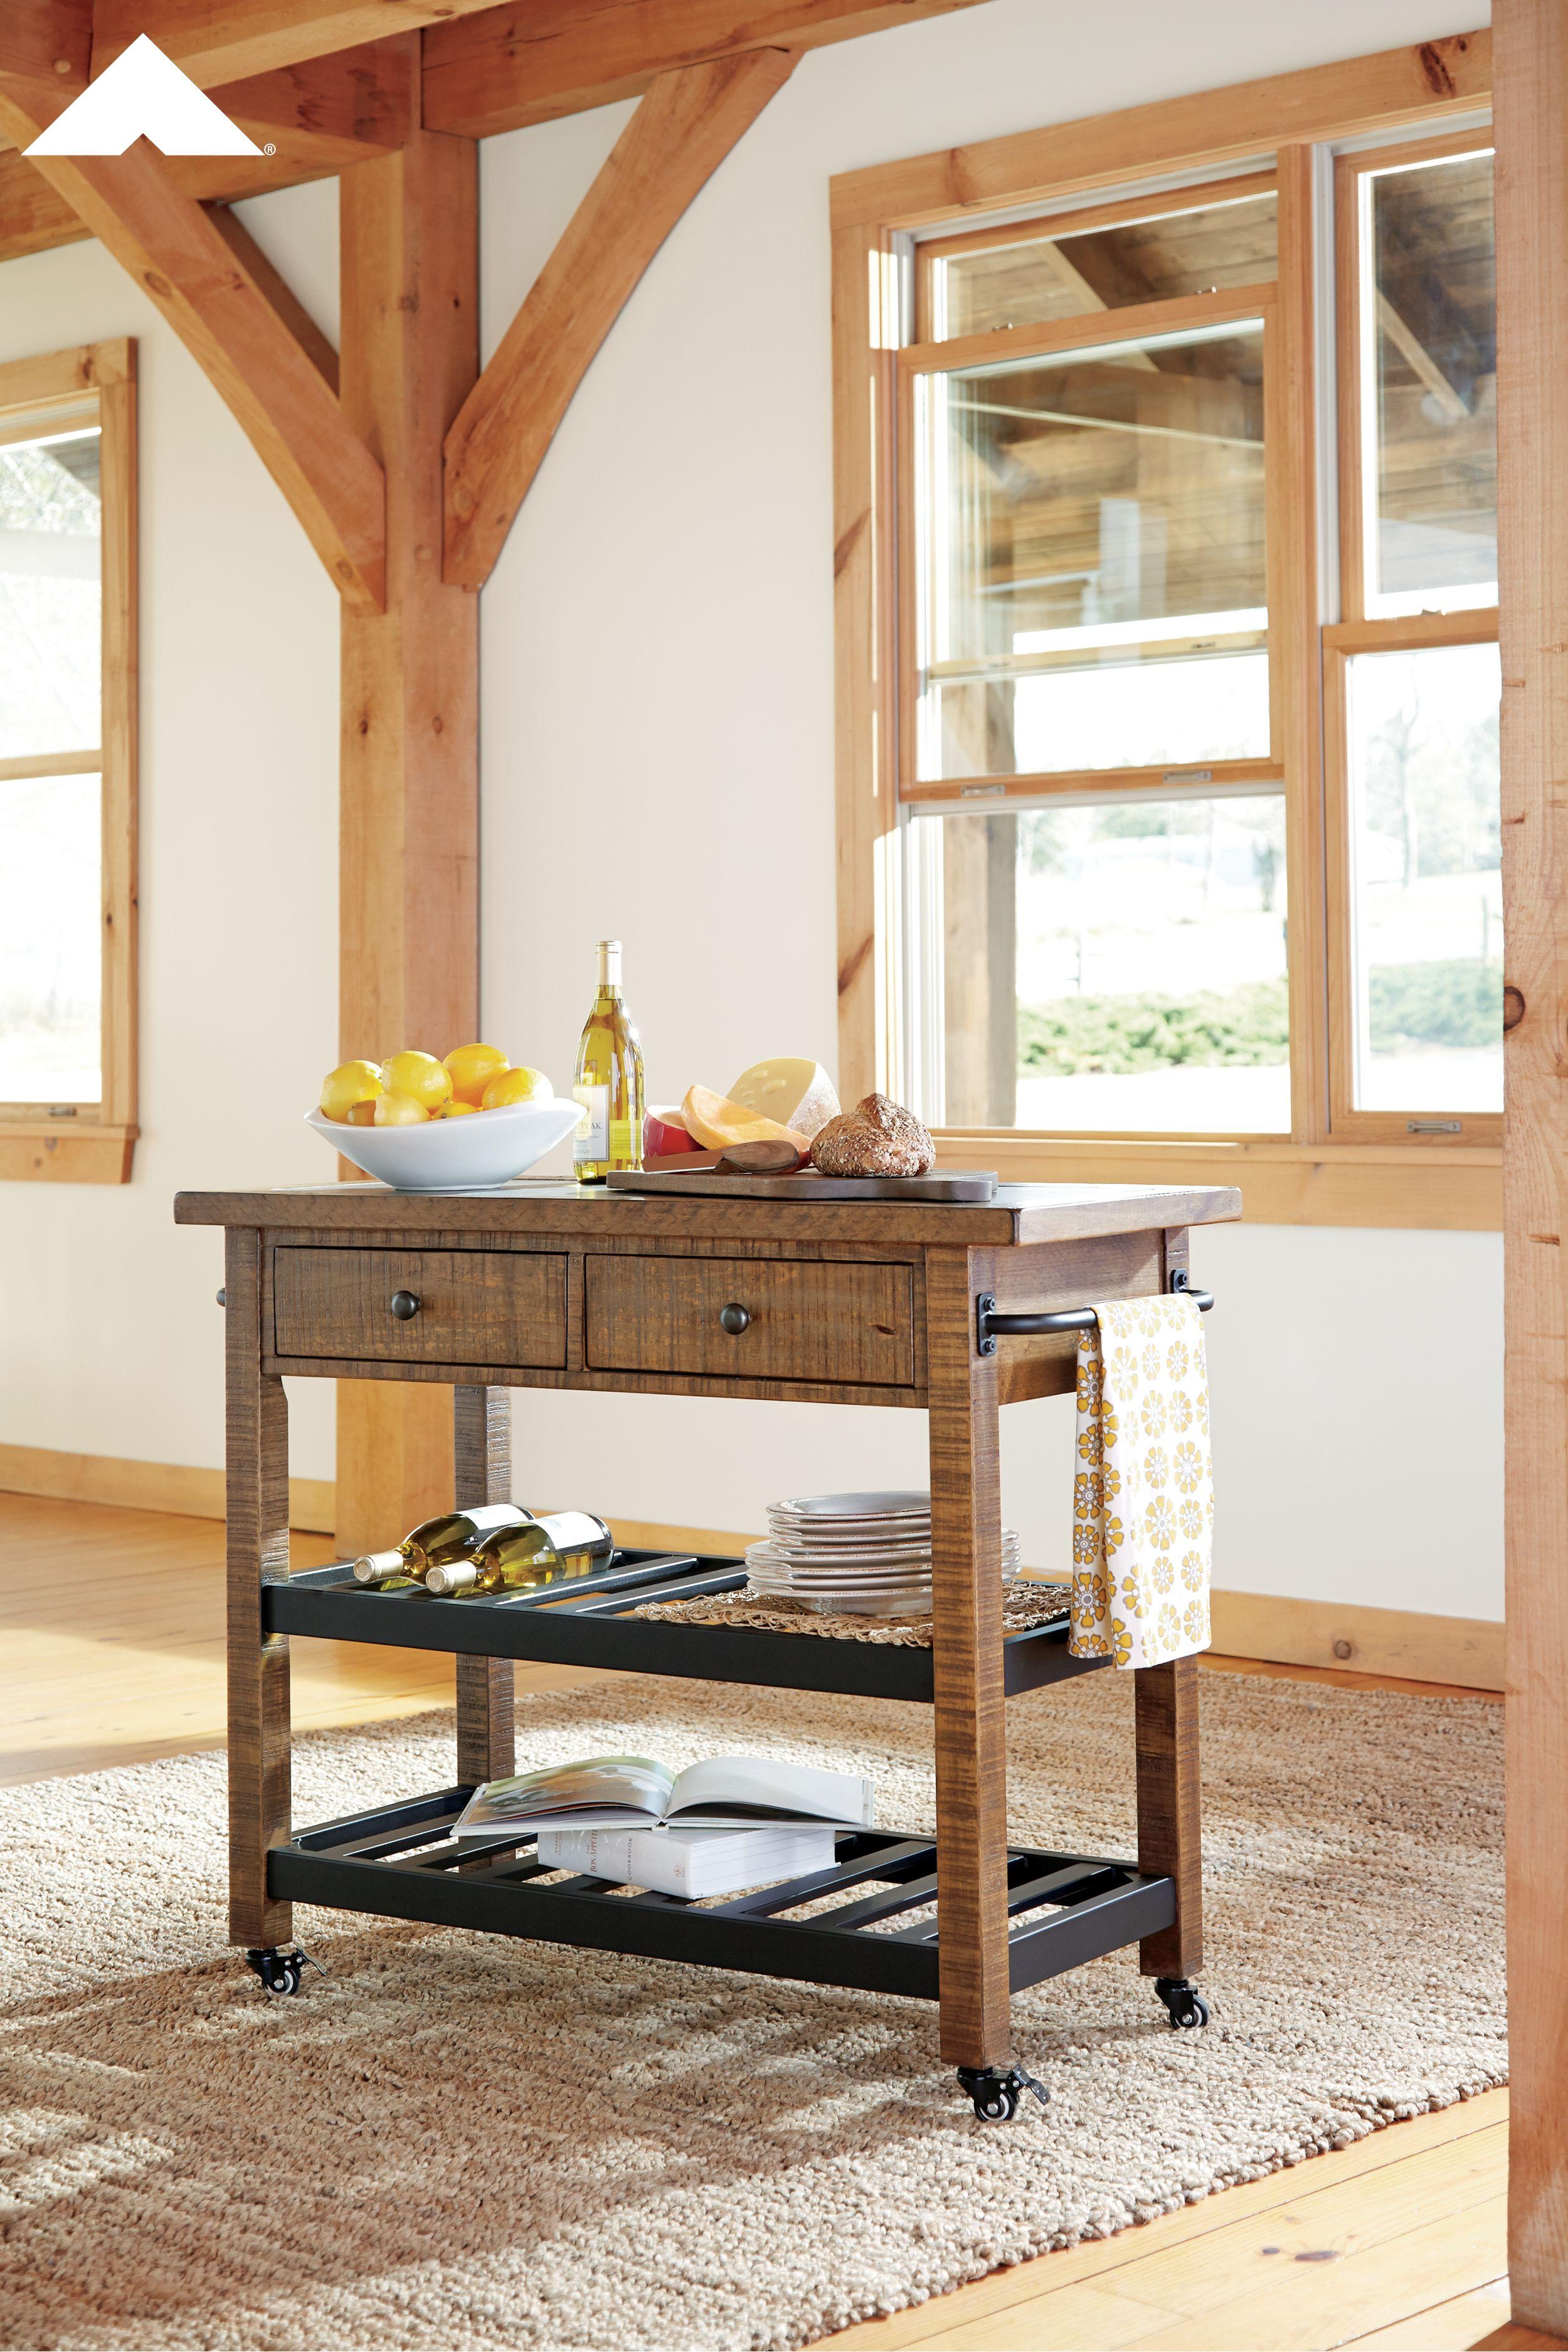 Marlijo Warm Brown Kitchen Cart By Ashley Furniture - #Ashleyfurniture